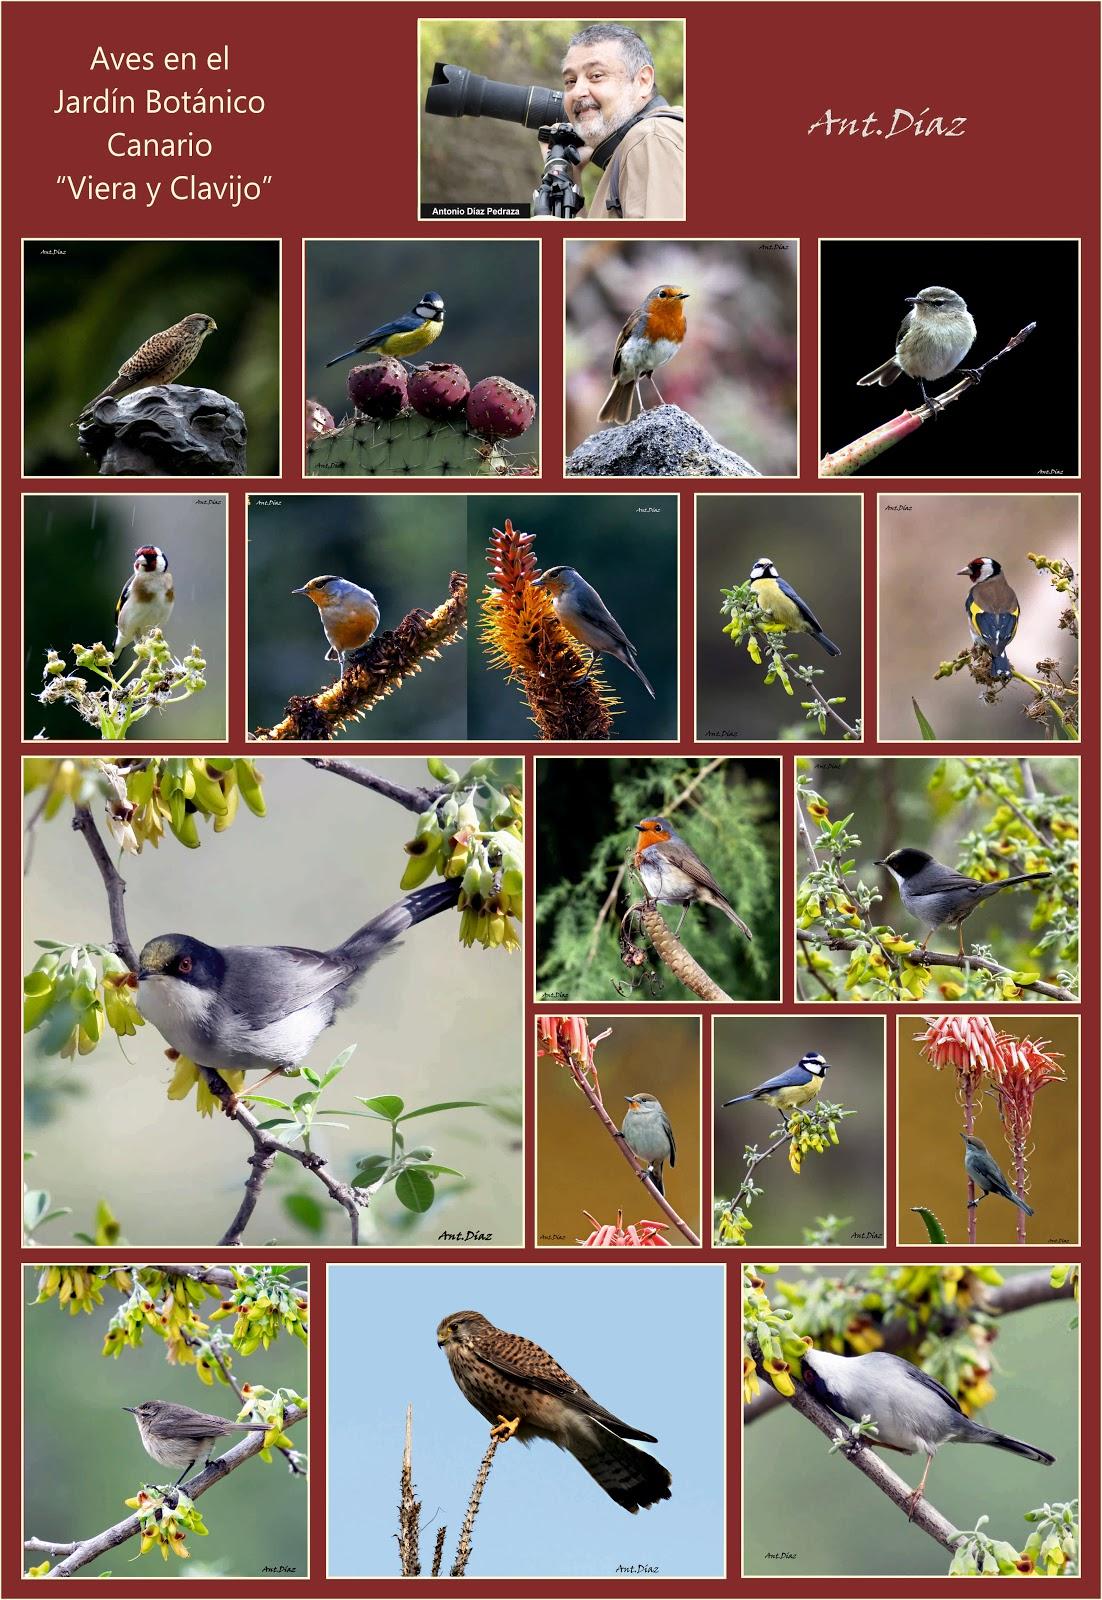 Exposici n fotogr fica aves en el jard n bot nico for Jardin botanico viera y clavijo